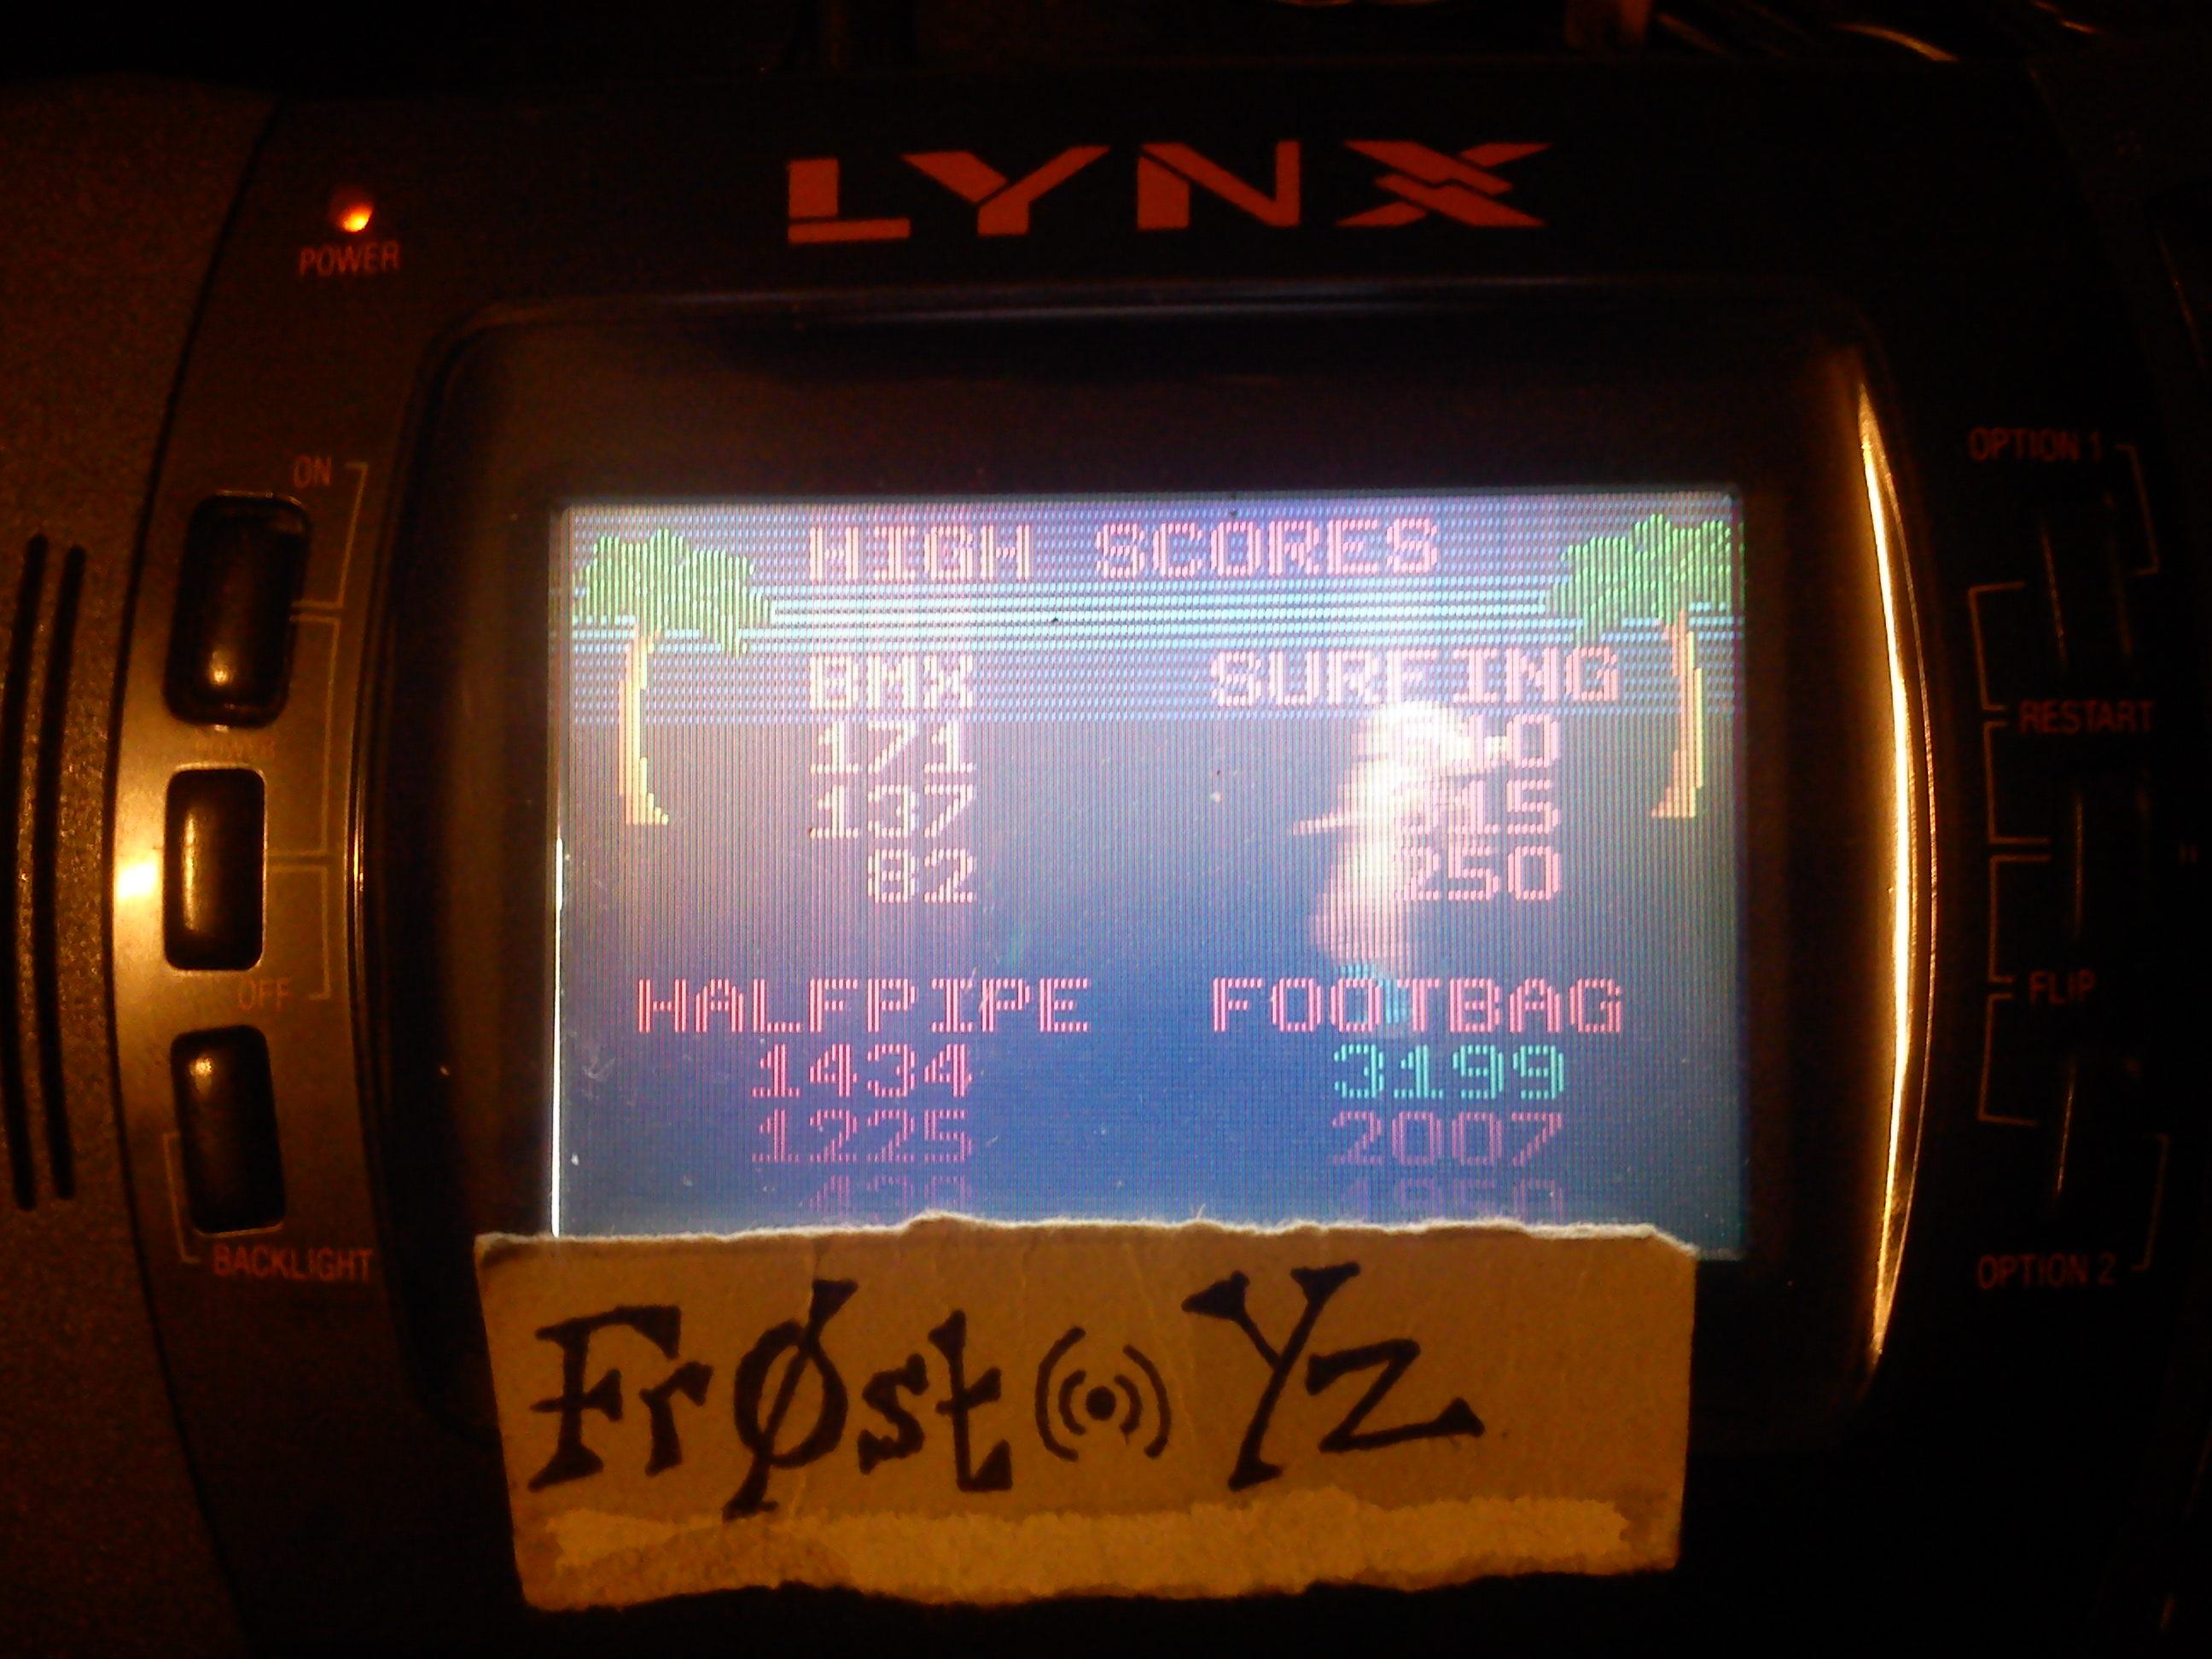 Fr0st: California Games: Footbag (Atari Lynx) 3,199 points on 2014-11-05 17:11:54